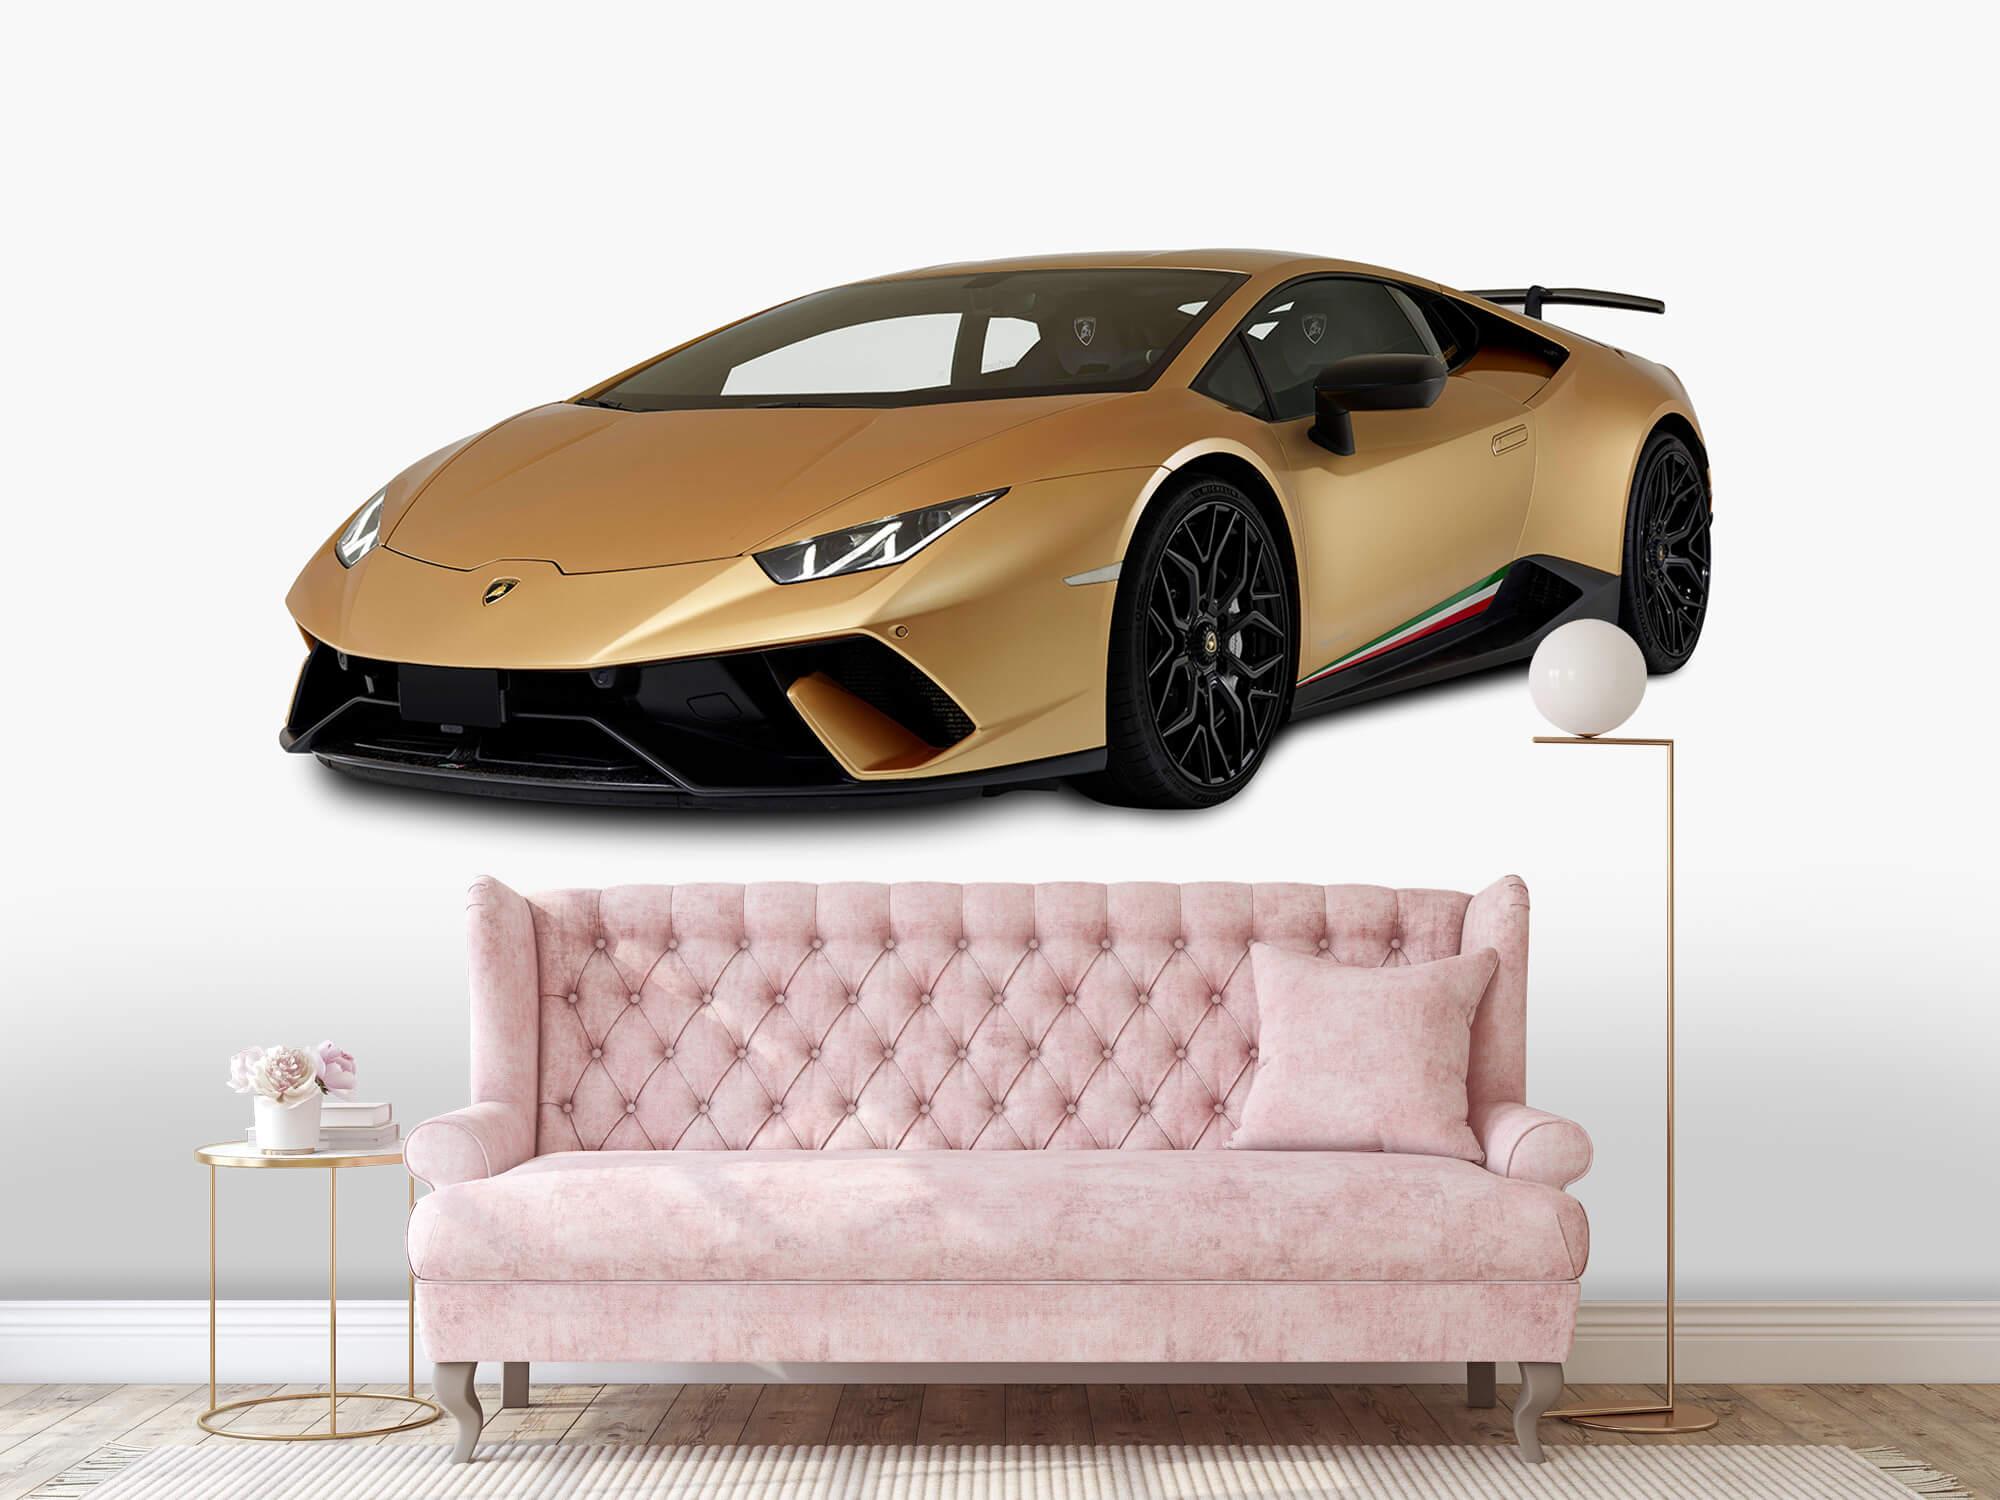 Wallpaper Lamborghini Huracán - Avant droit, blanc 12